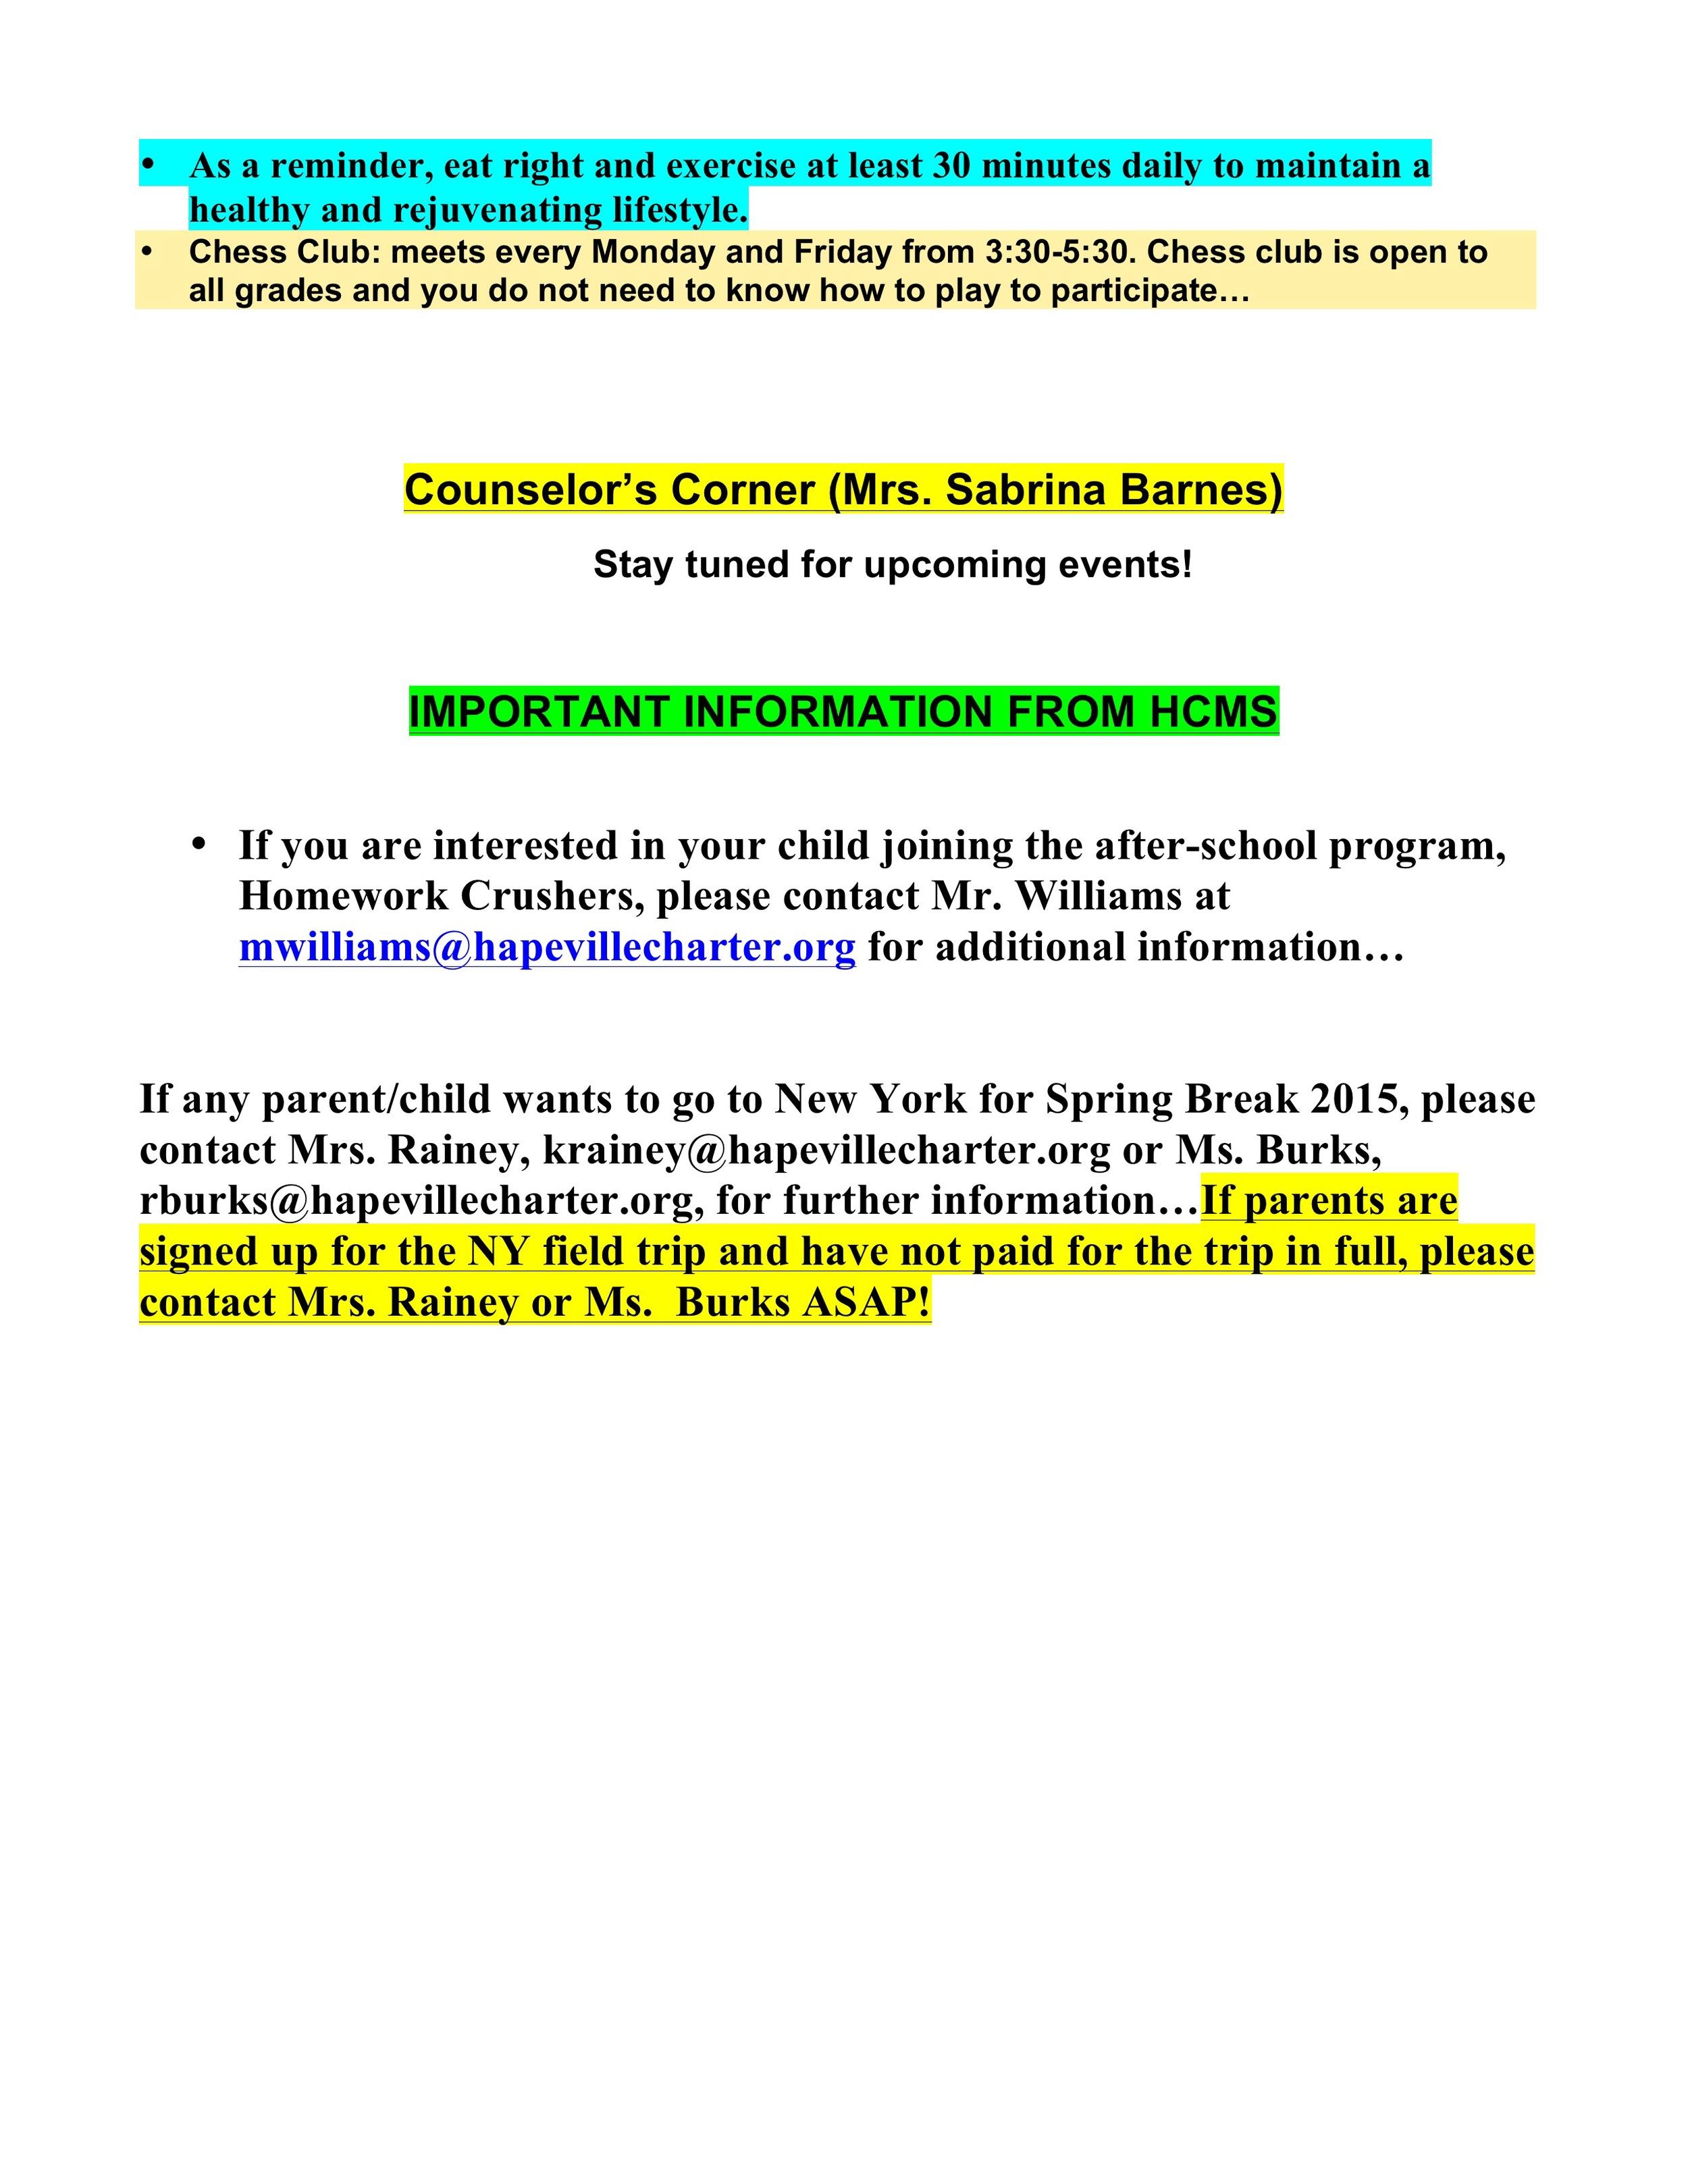 Newsletter Image7th grade jan 20-23 4.jpeg